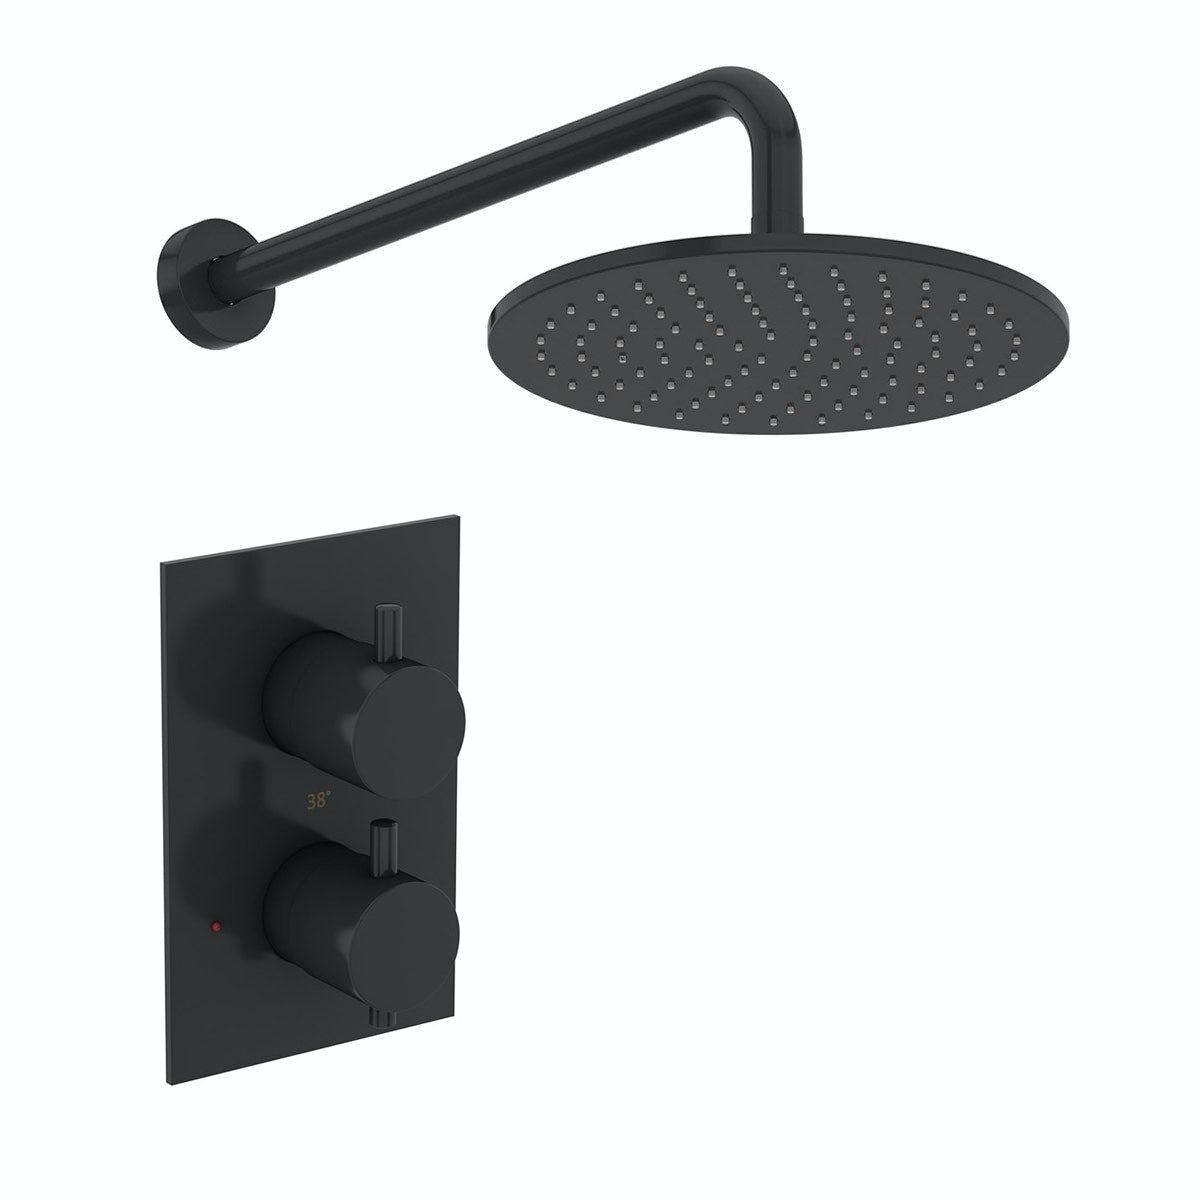 Mode Spencer round thermostatic twin valve matt black shower set